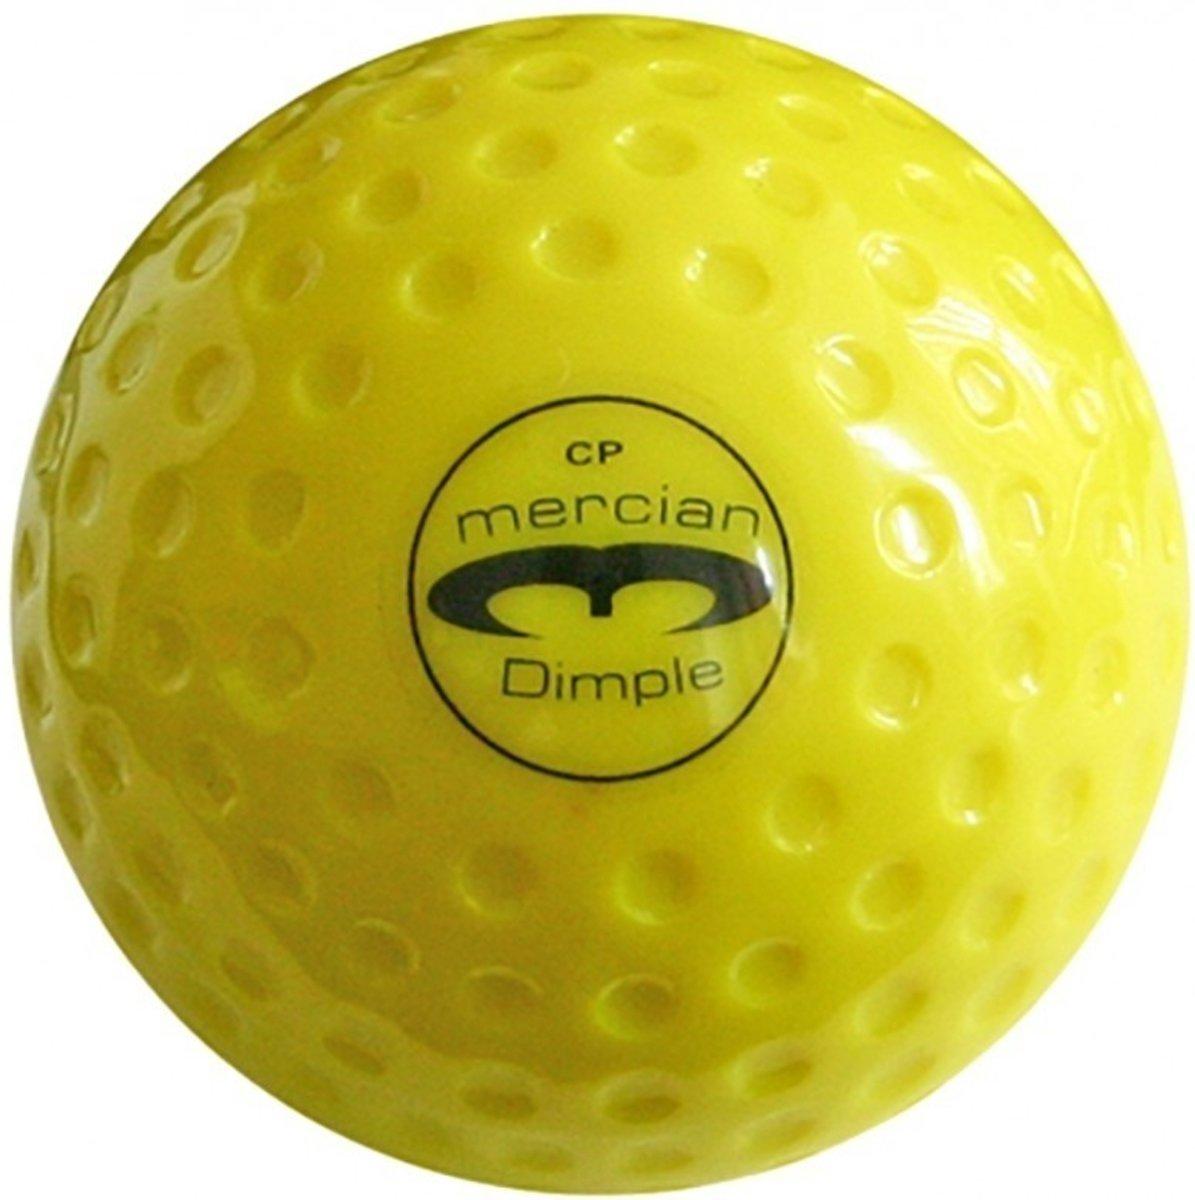 Hockeybal Dimple - geel - no logo - 12 stuks